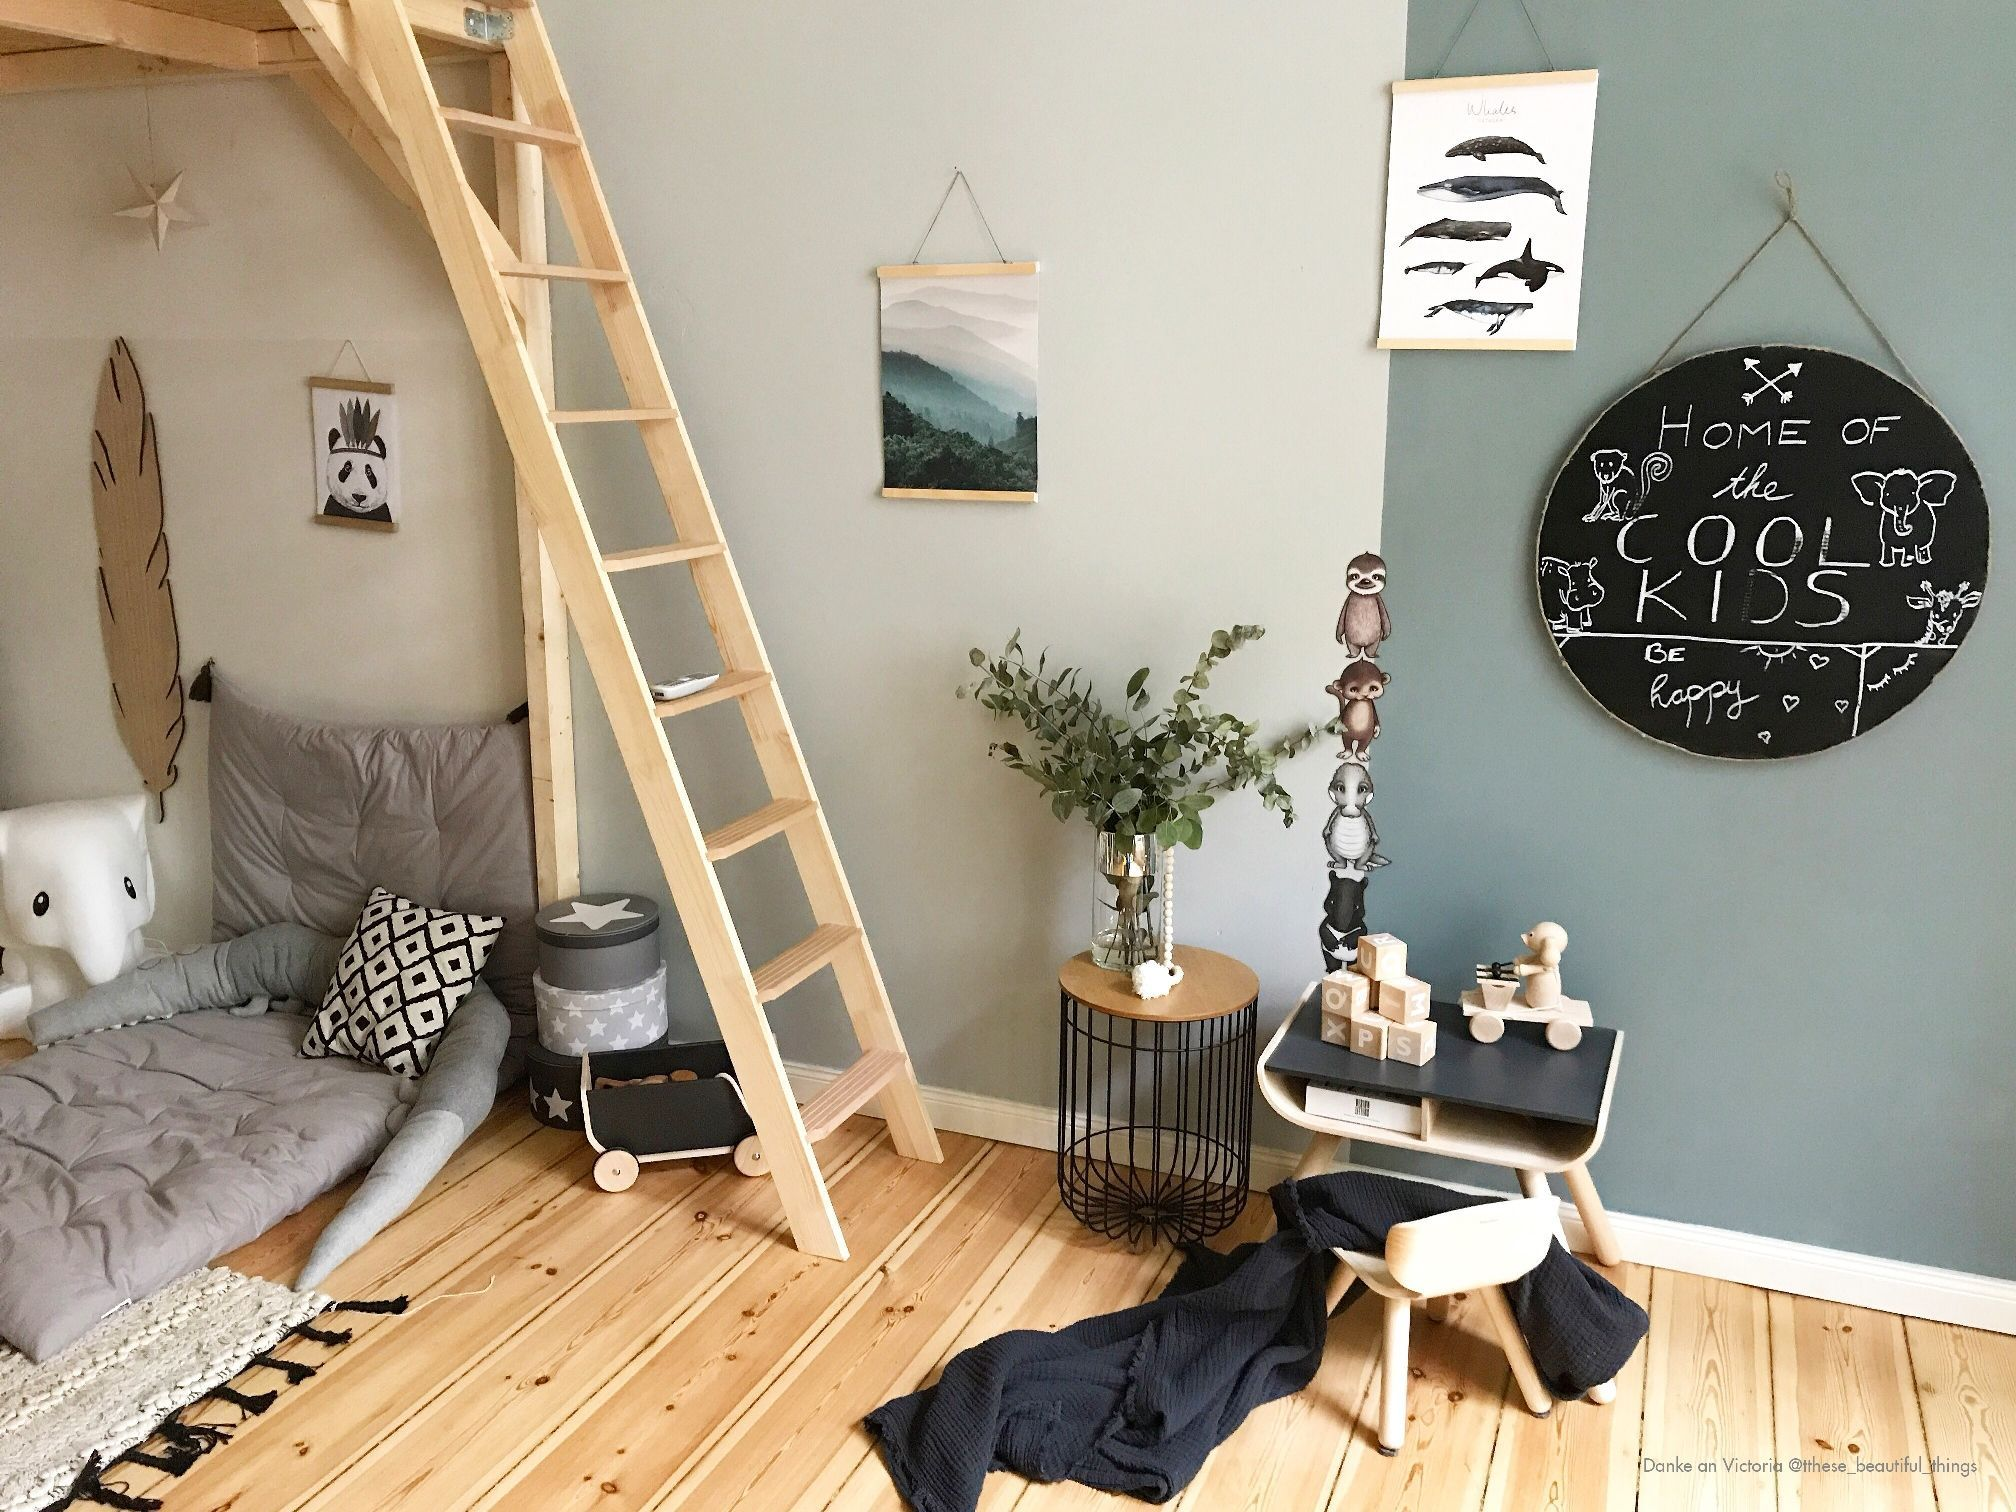 sch ne gr n grau kombi farben pinterest kinderzimmer wandfarbe und wandfarbe kinderzimmer. Black Bedroom Furniture Sets. Home Design Ideas